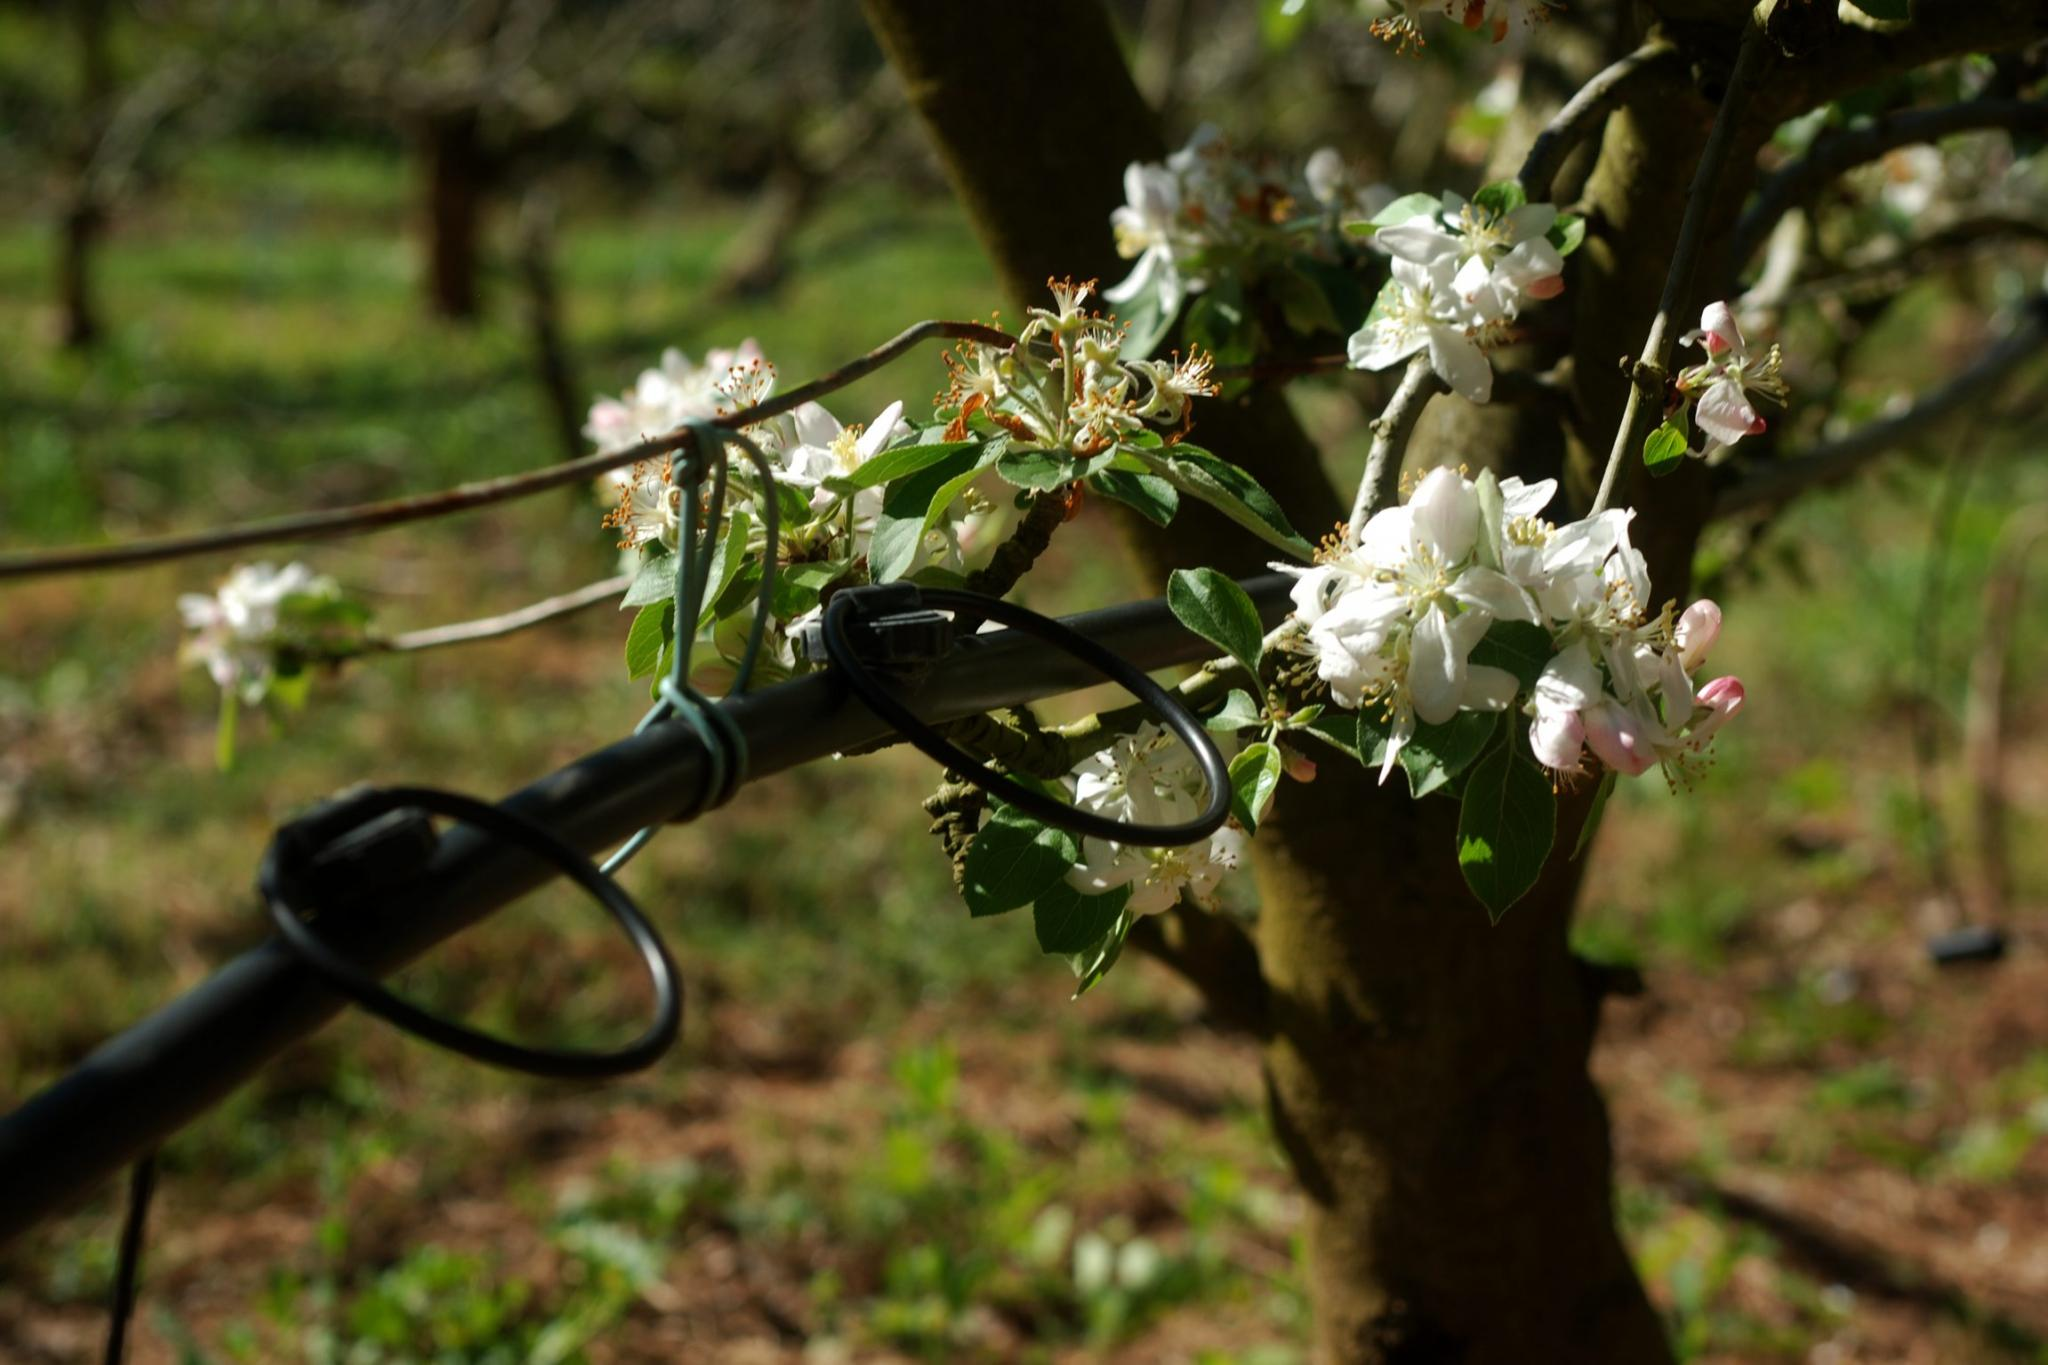 The Loquat's are in full flower